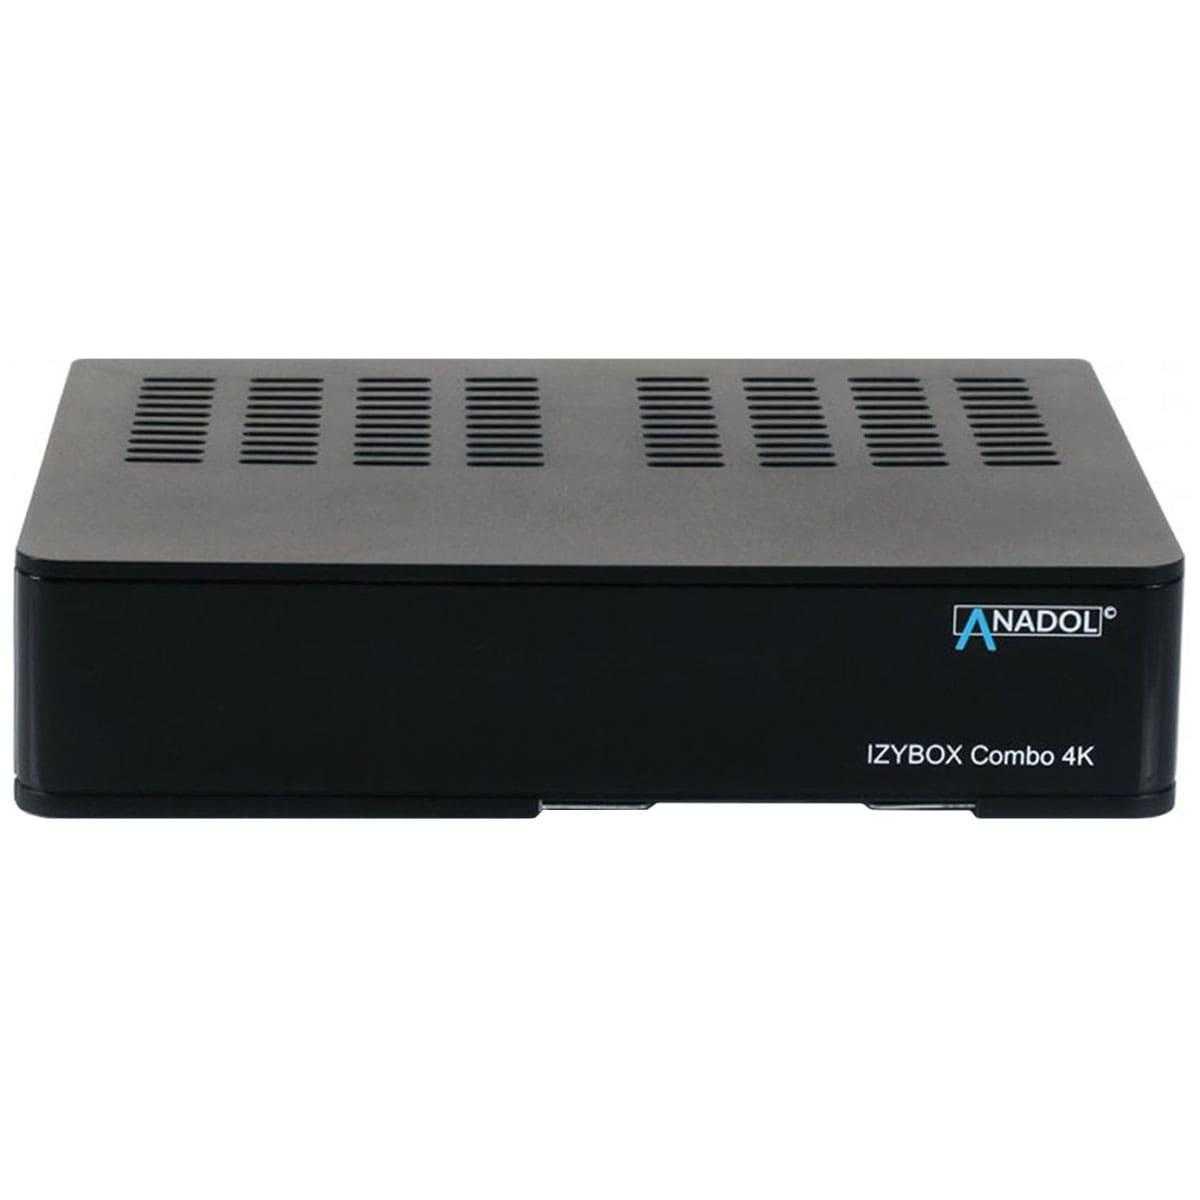 Anadol IZYBOX Combo 4K UHD DVB-S2/C/T2 H.265 HEVC HDMI USB LAN Sat & Kabel Receiver Schwarz RECANA015